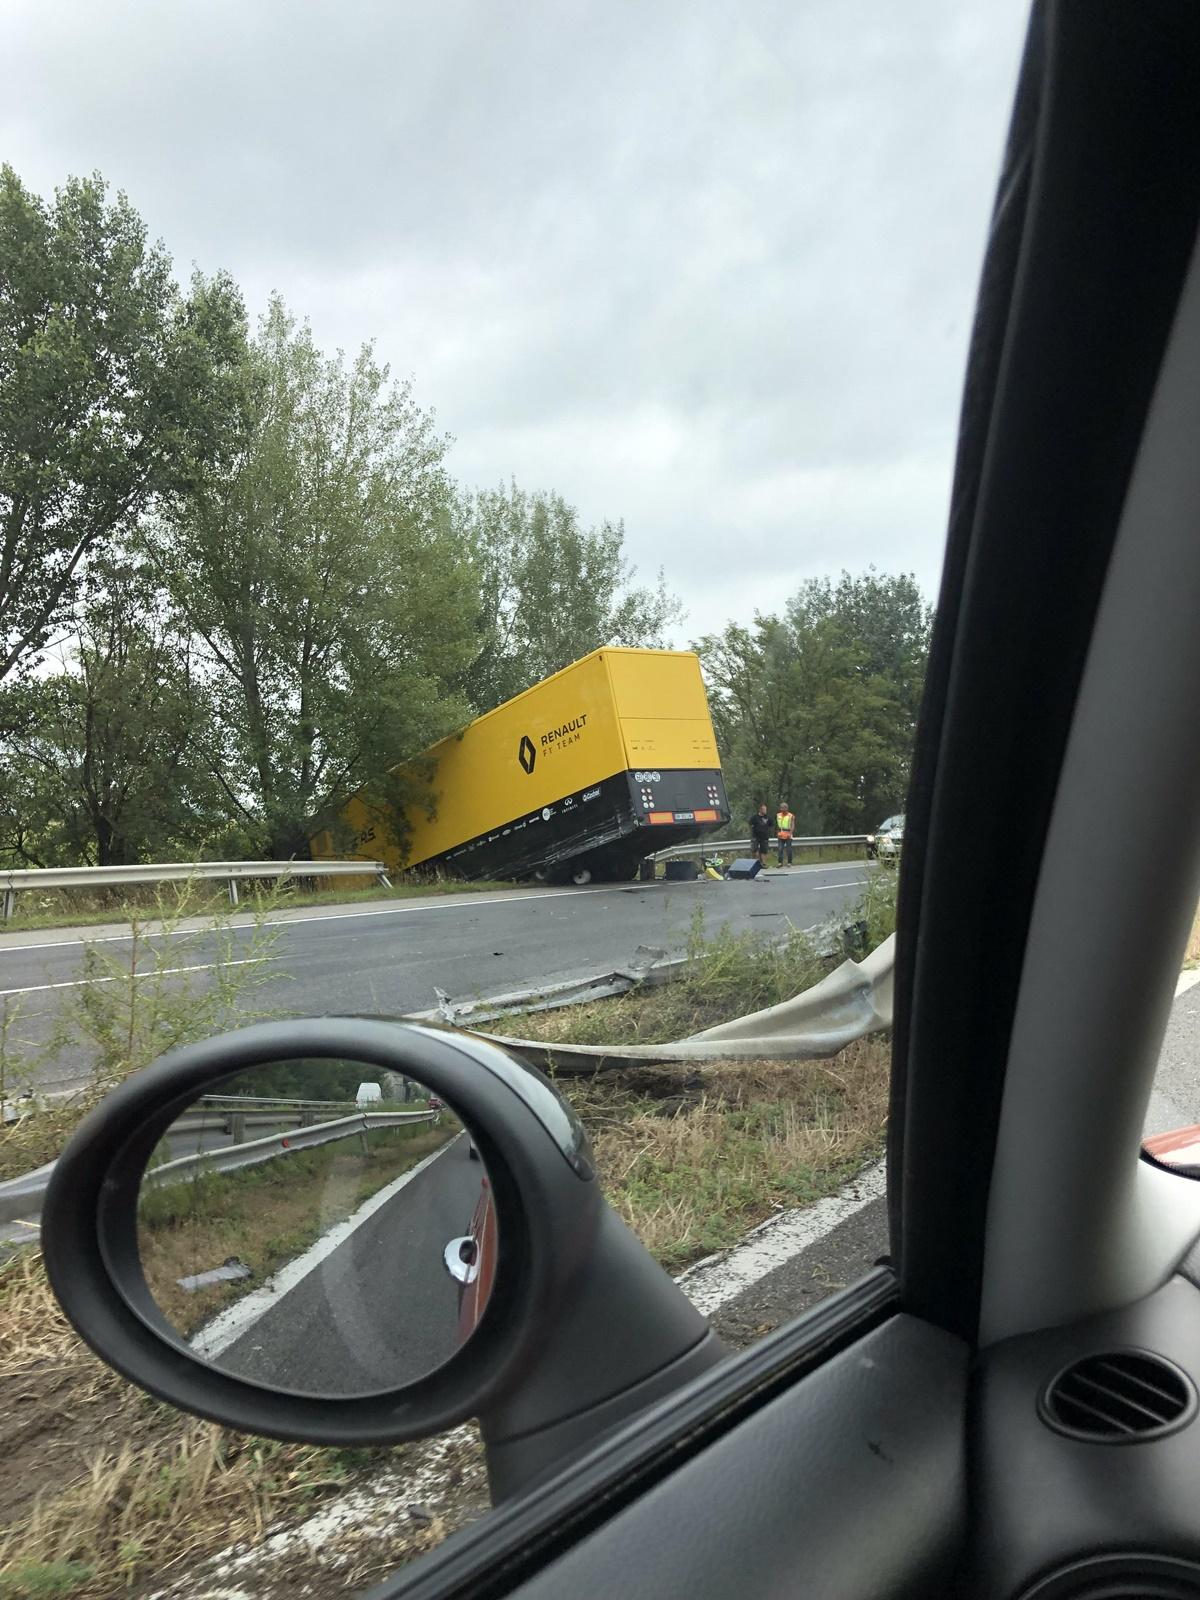 Drama compleet Renault F1 truck crasht in Hongarije full